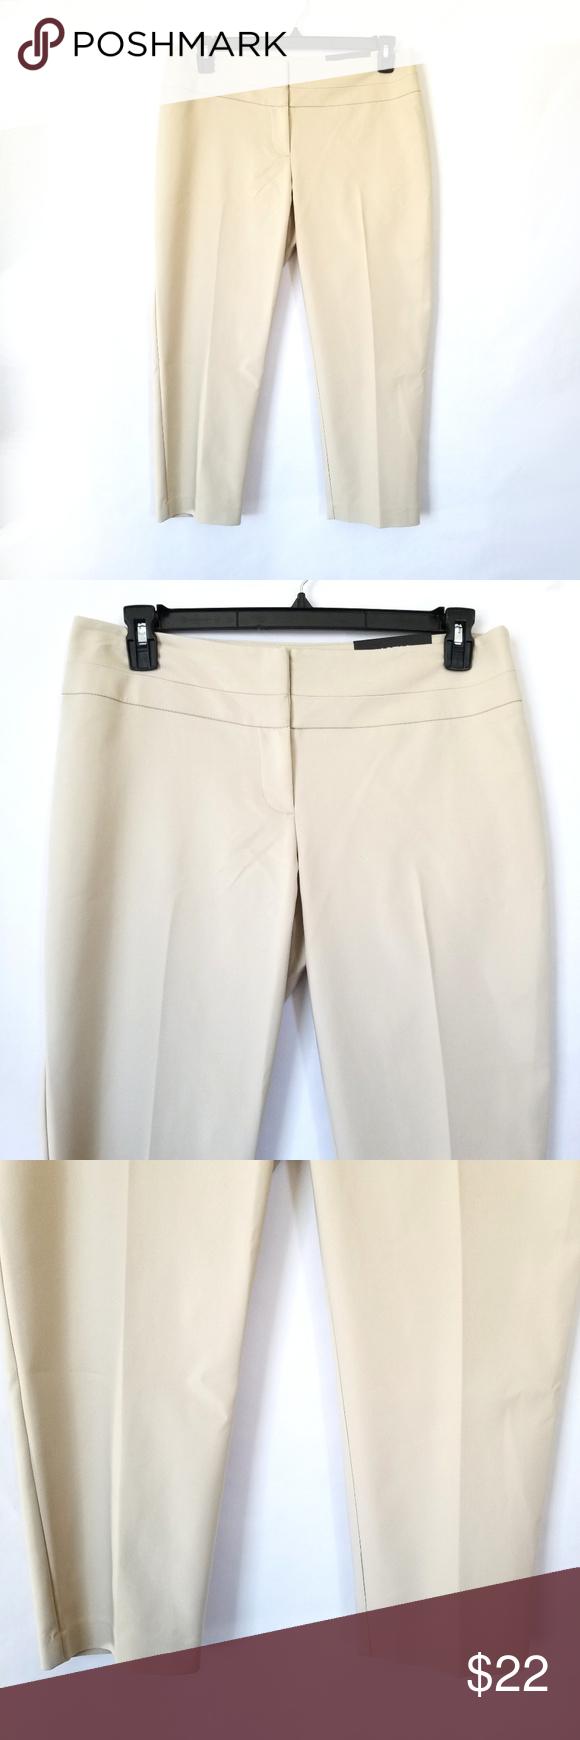 d7f93cfea22 Apt. 9 Torie Modern Fit Capri Dress Pants Size 12 New with tags. Size